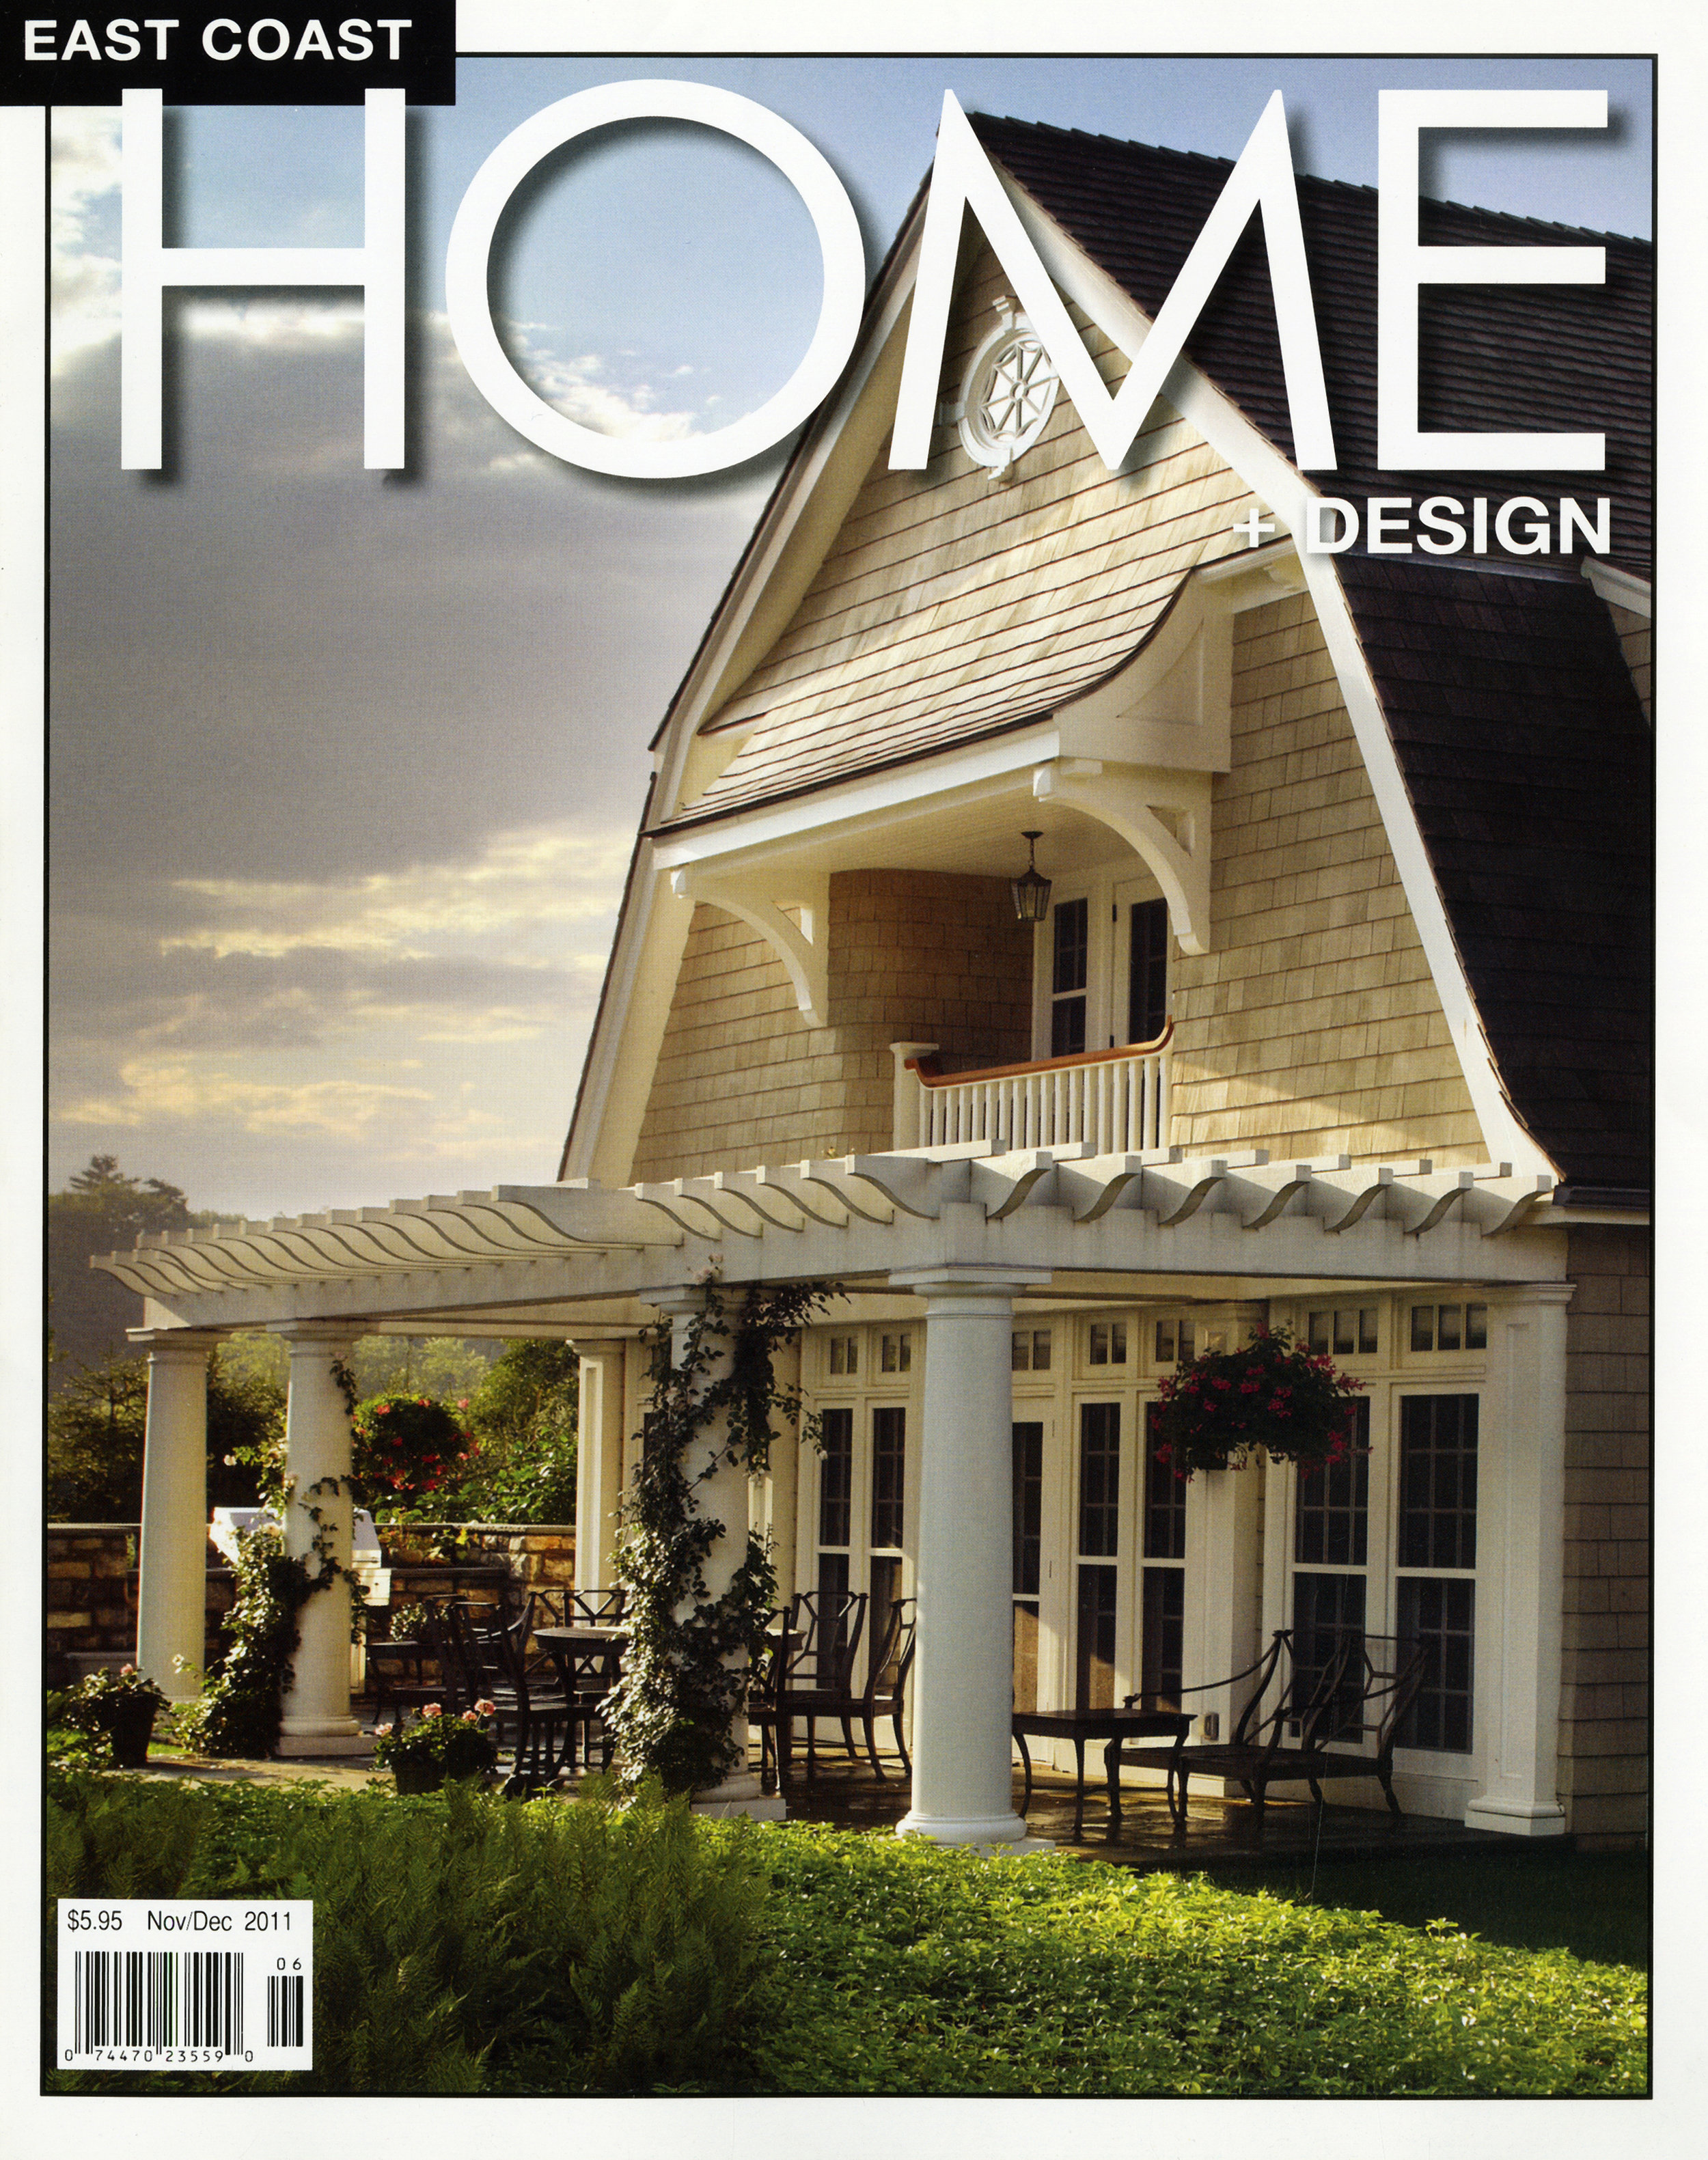 Home+Design_Cover.jpg